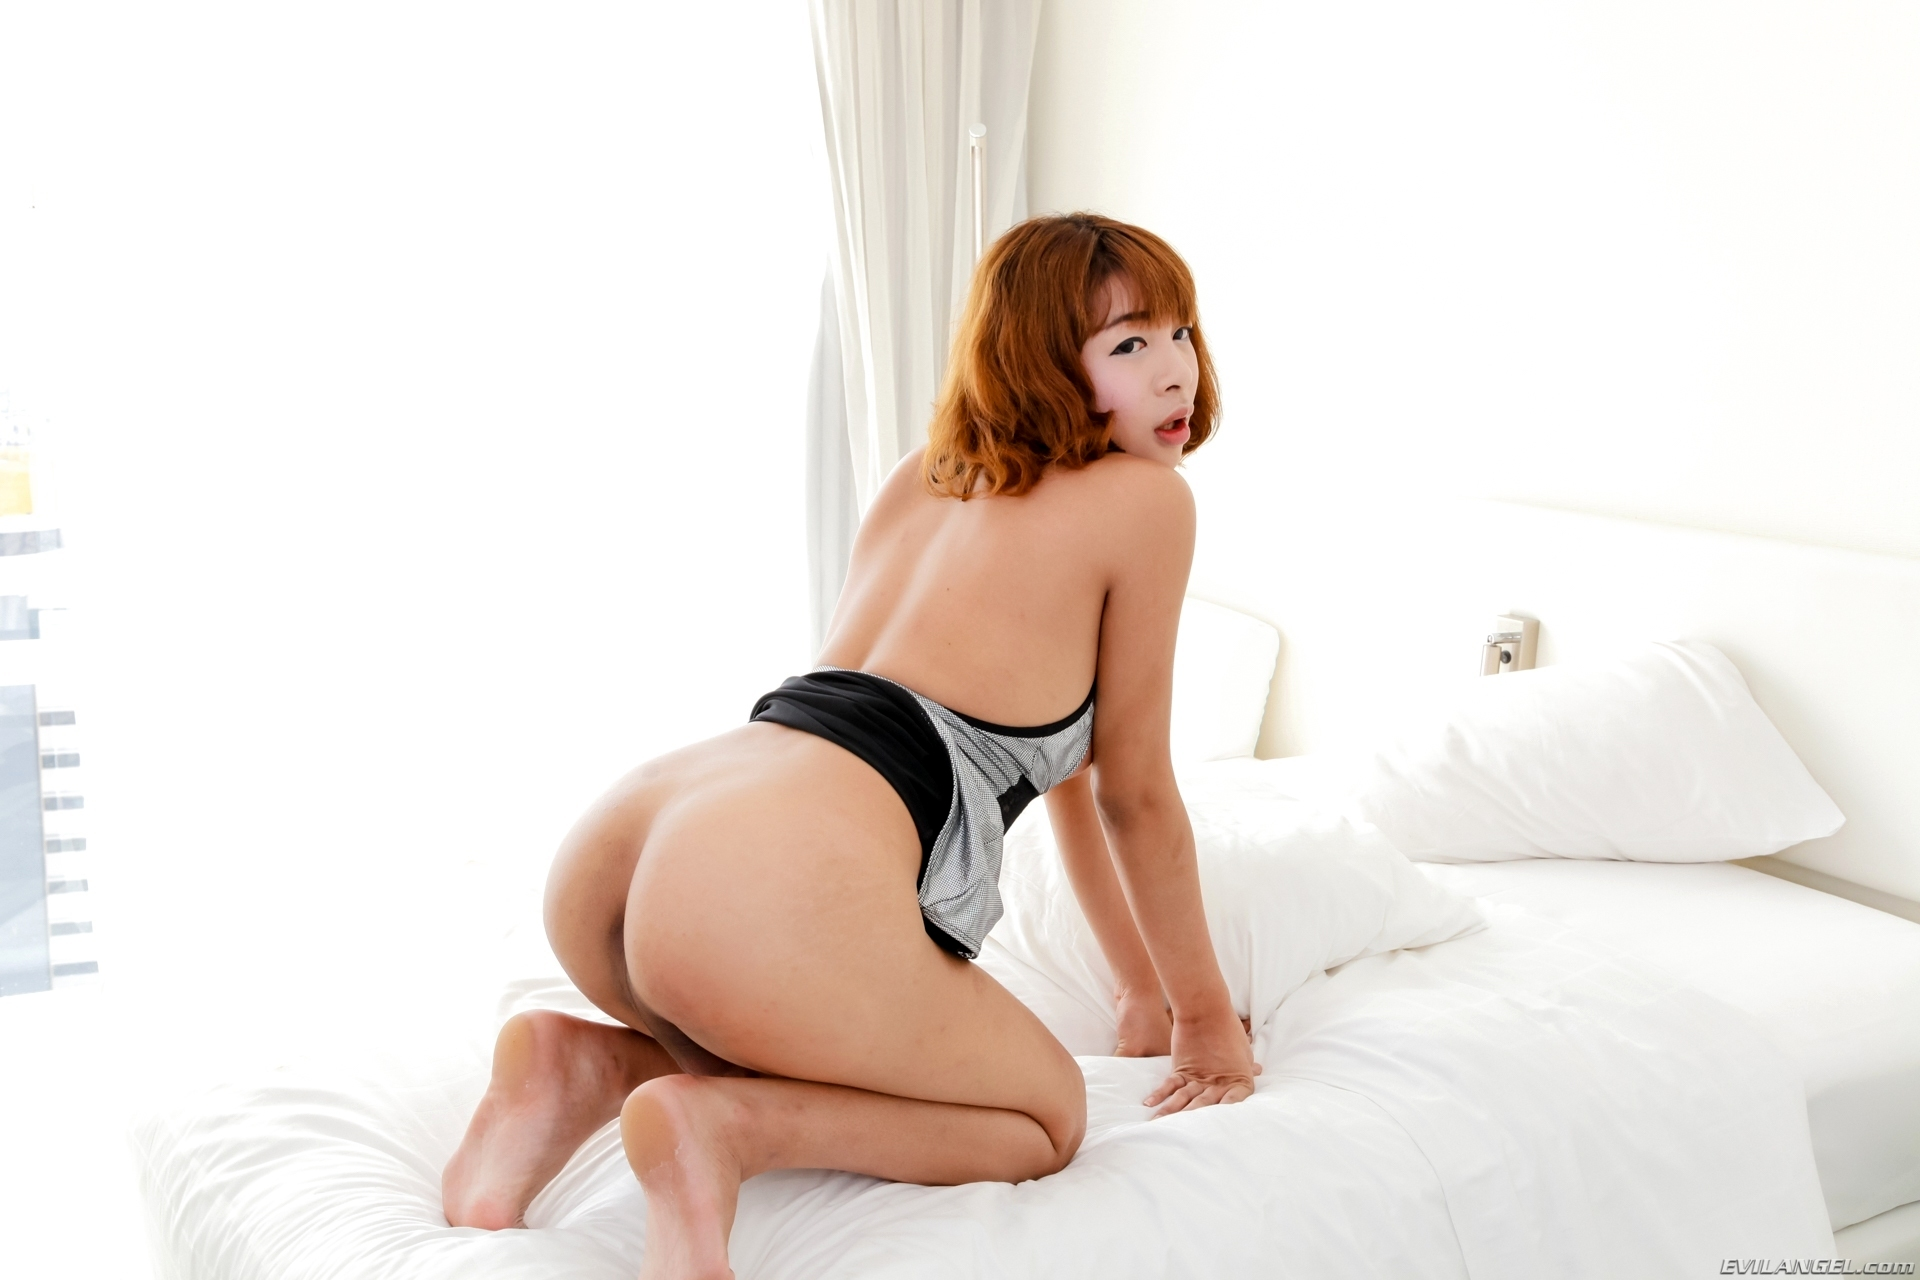 Ya Suggestive Femboy Teasing With Her Naked Body